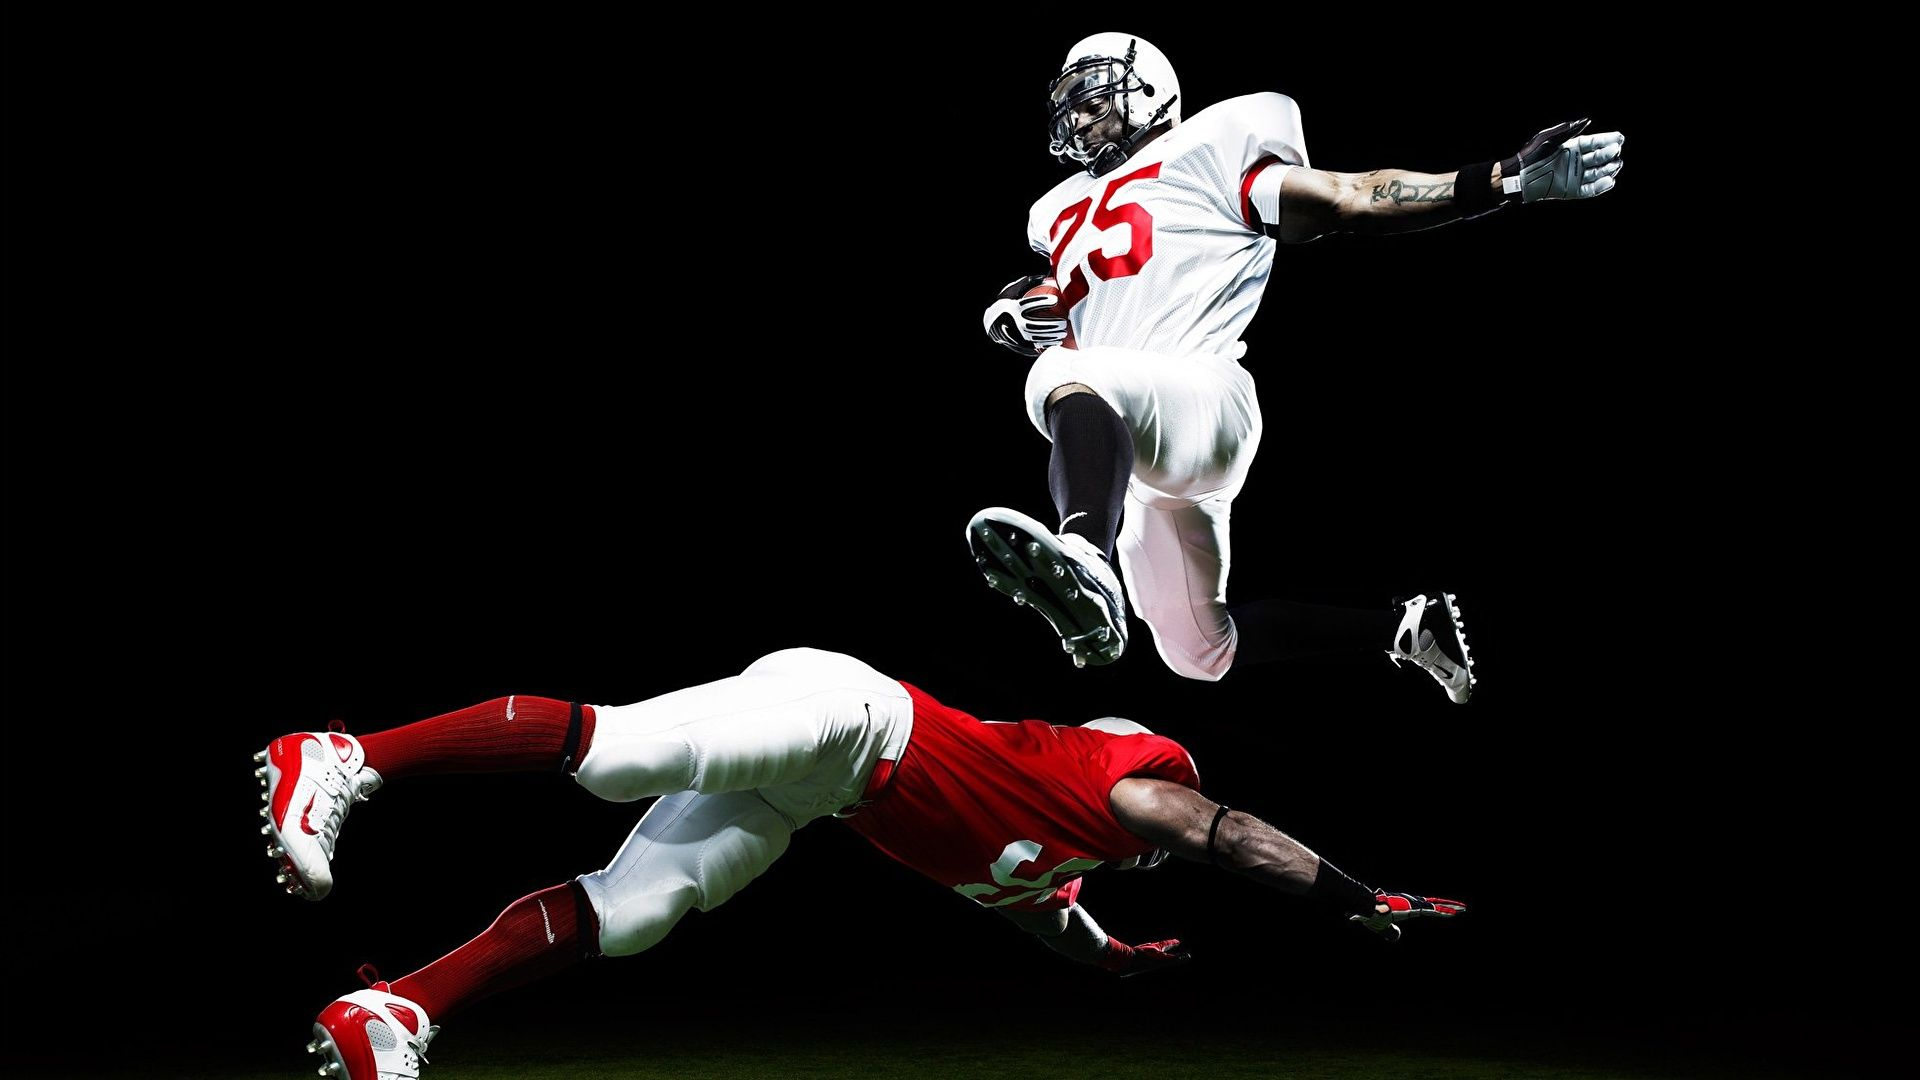 League Of American Football